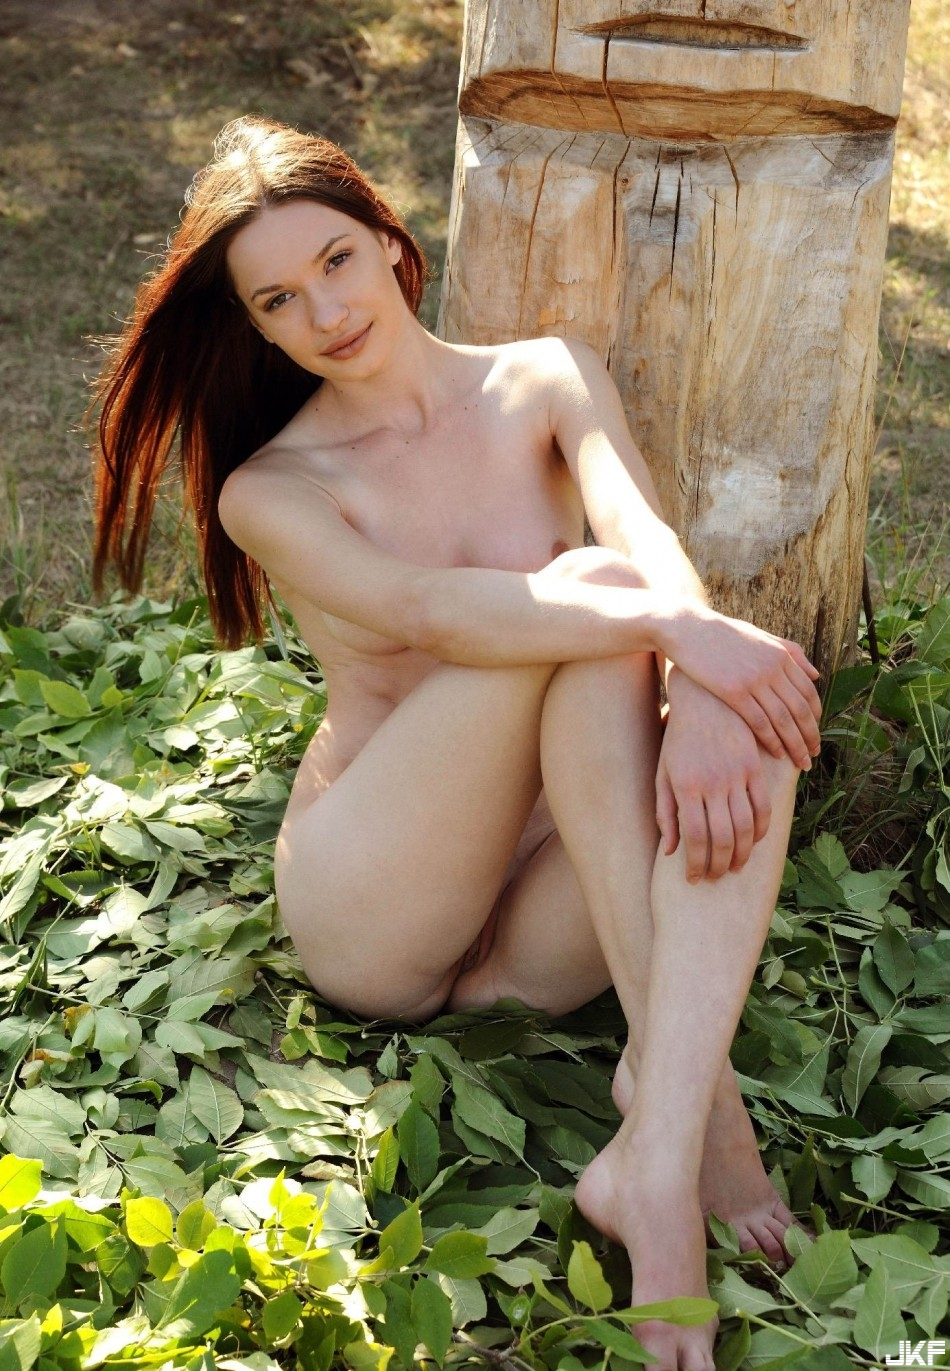 9679_potaskukha_u_derevjannogo_istukana_big_8.jpg